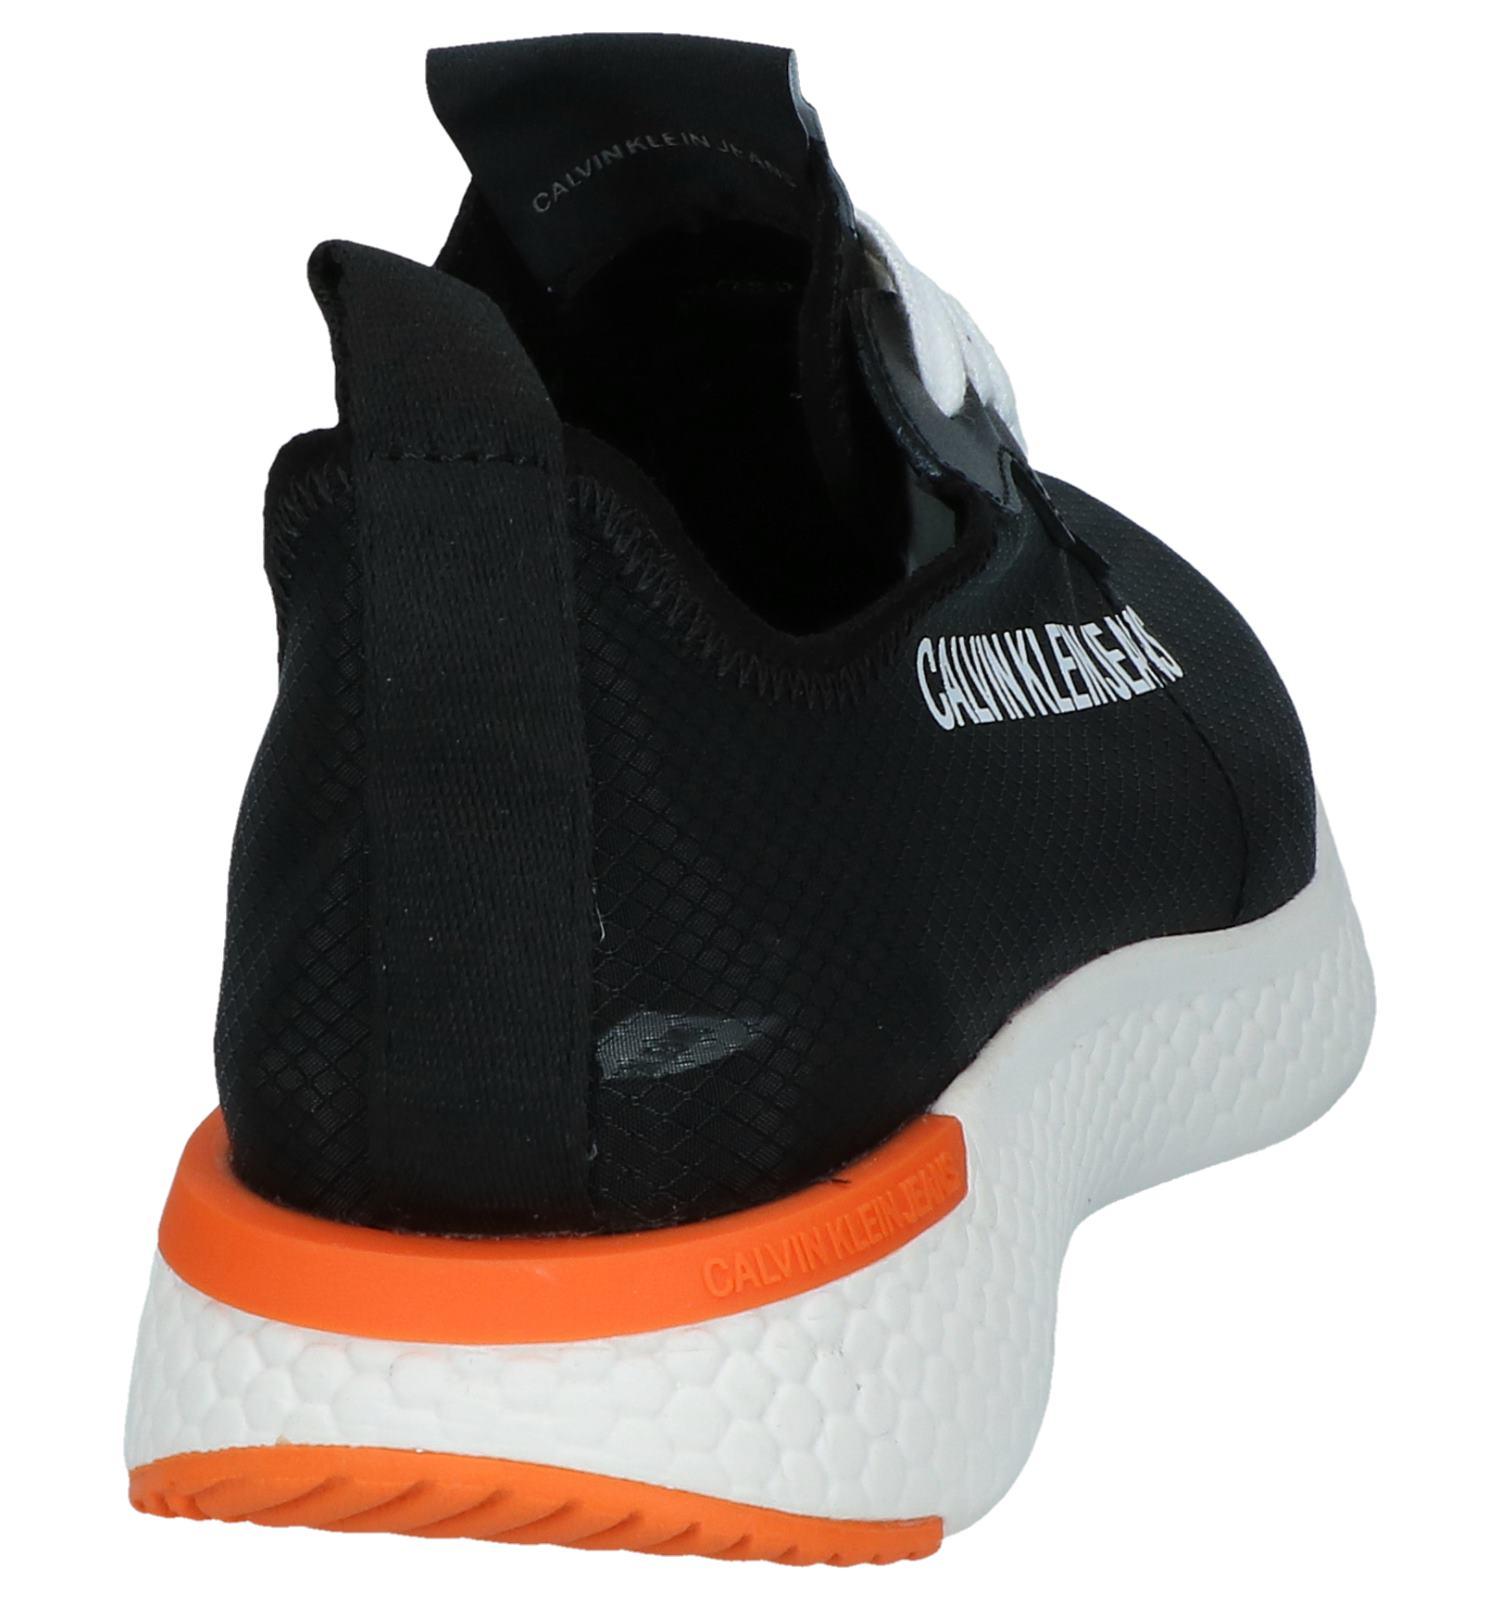 Calvin Sneakers Zwarte Alexia Sneakers Zwarte Klein Alexia Sneakers Calvin Calvin Zwarte Klein uK3lF5J1Tc